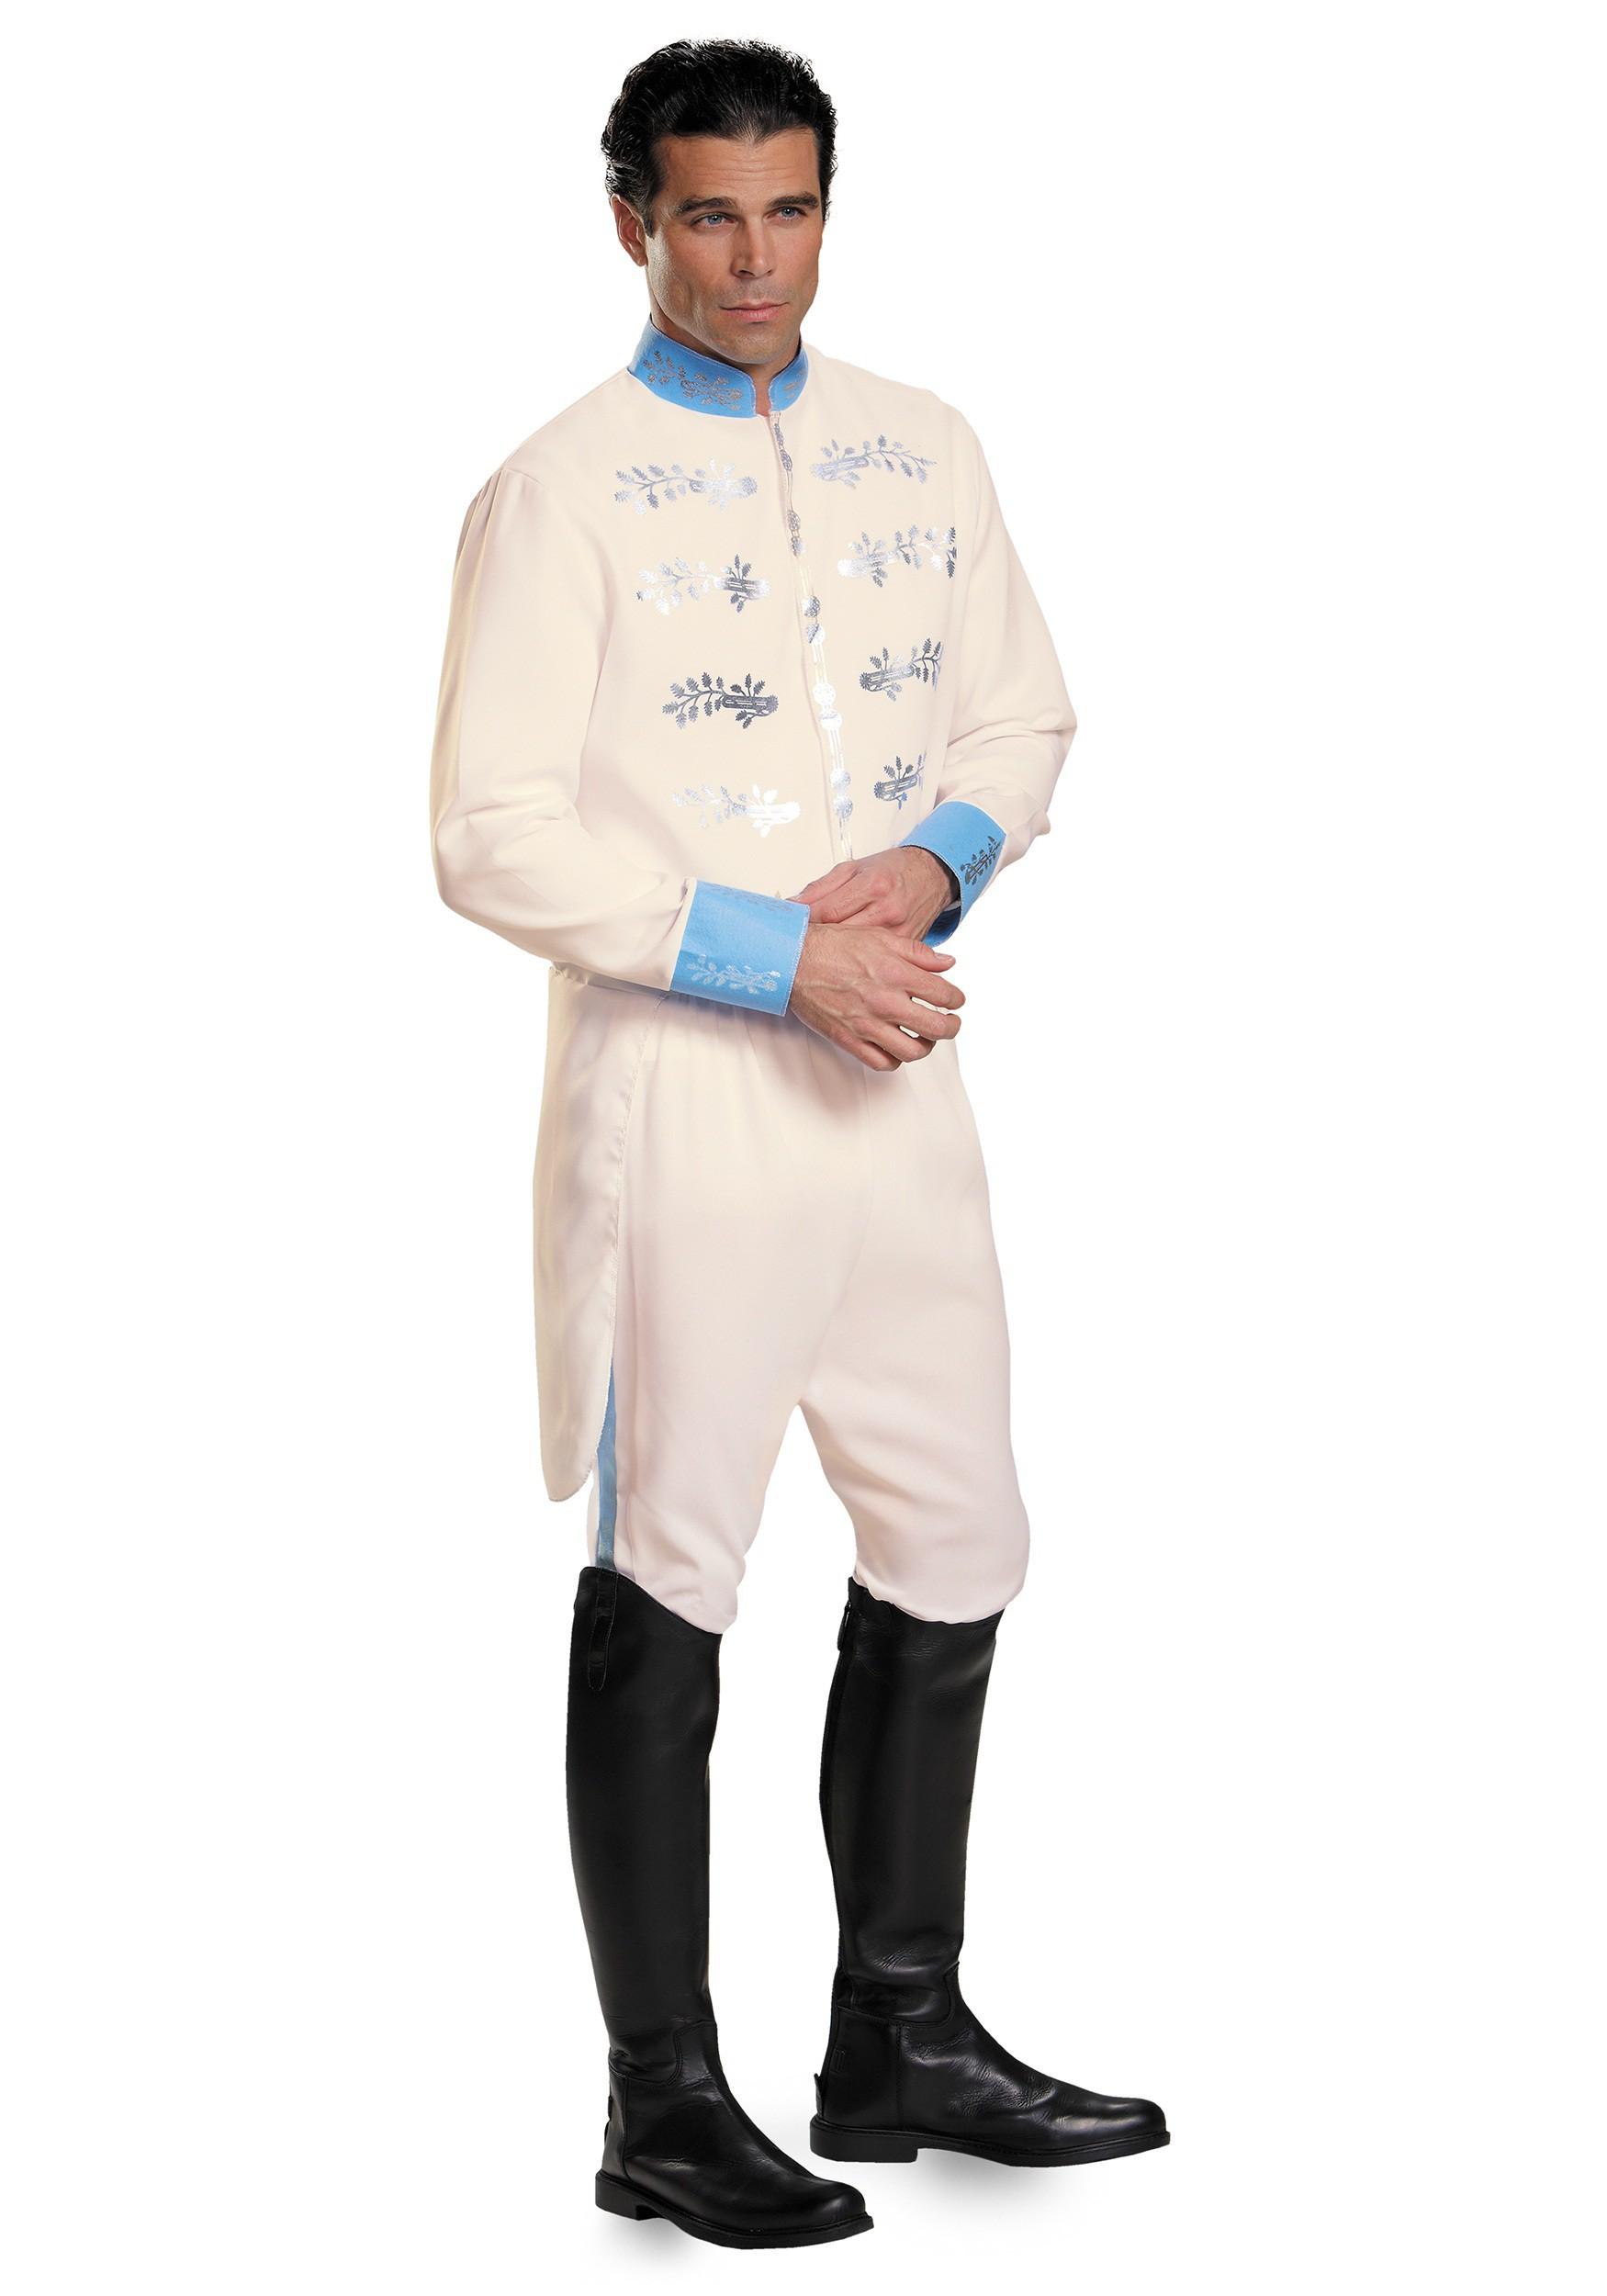 Prince Charming Costumes